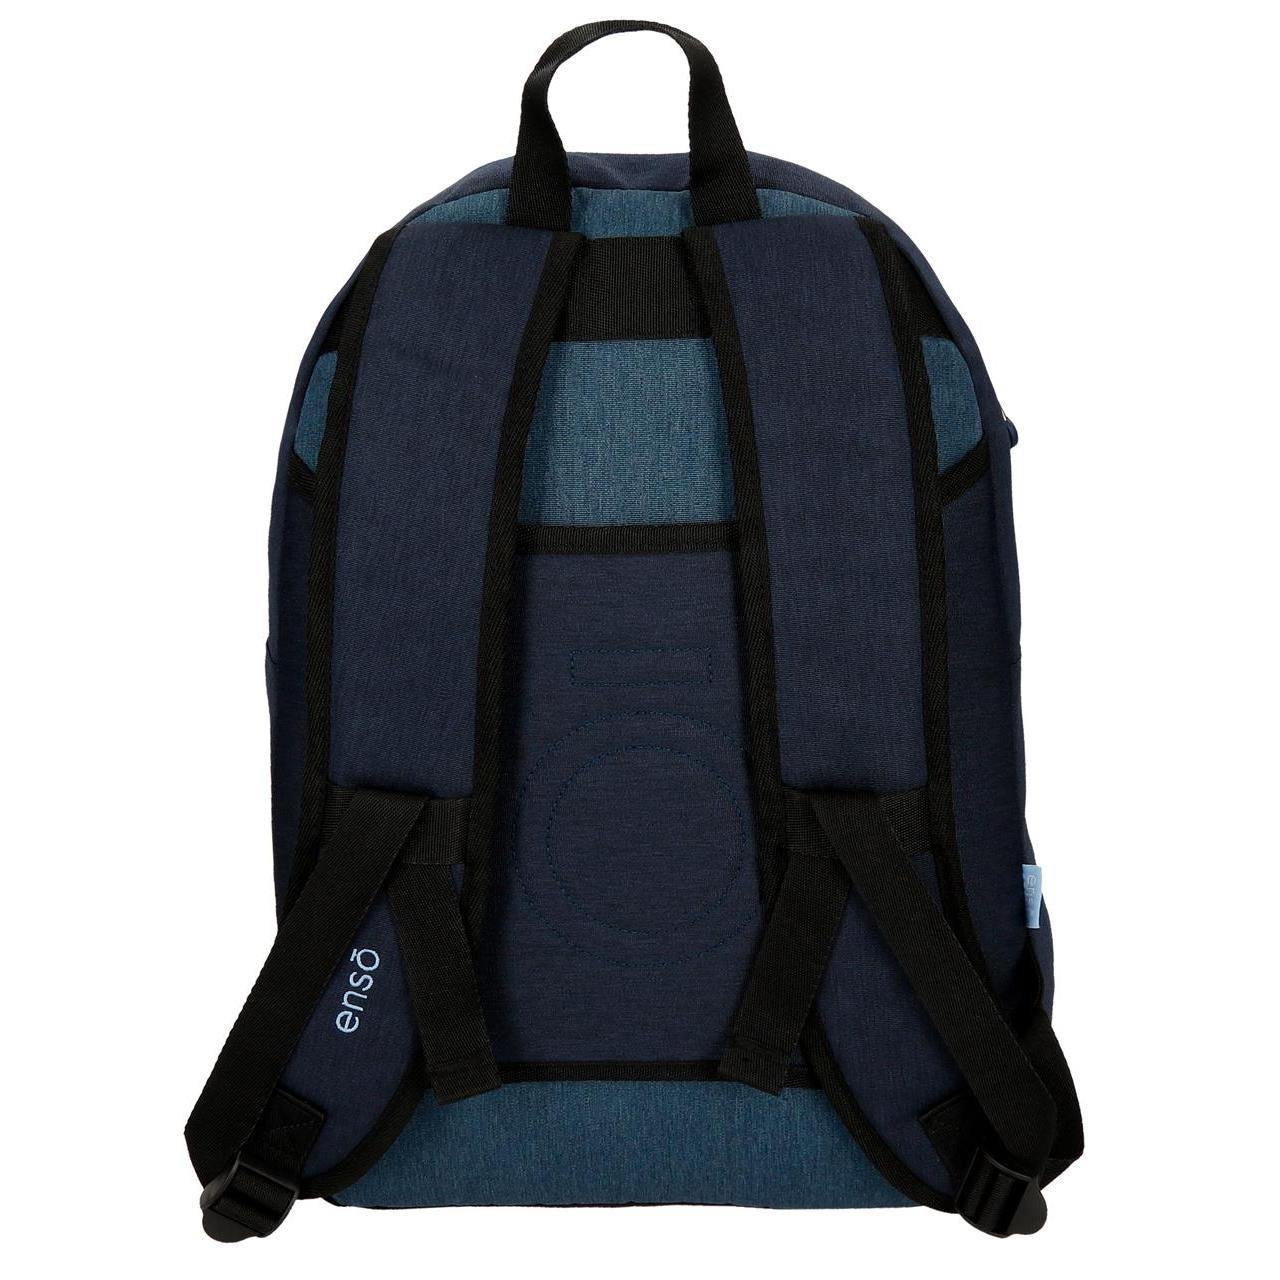 Mochila Portaordenador Enso Blue